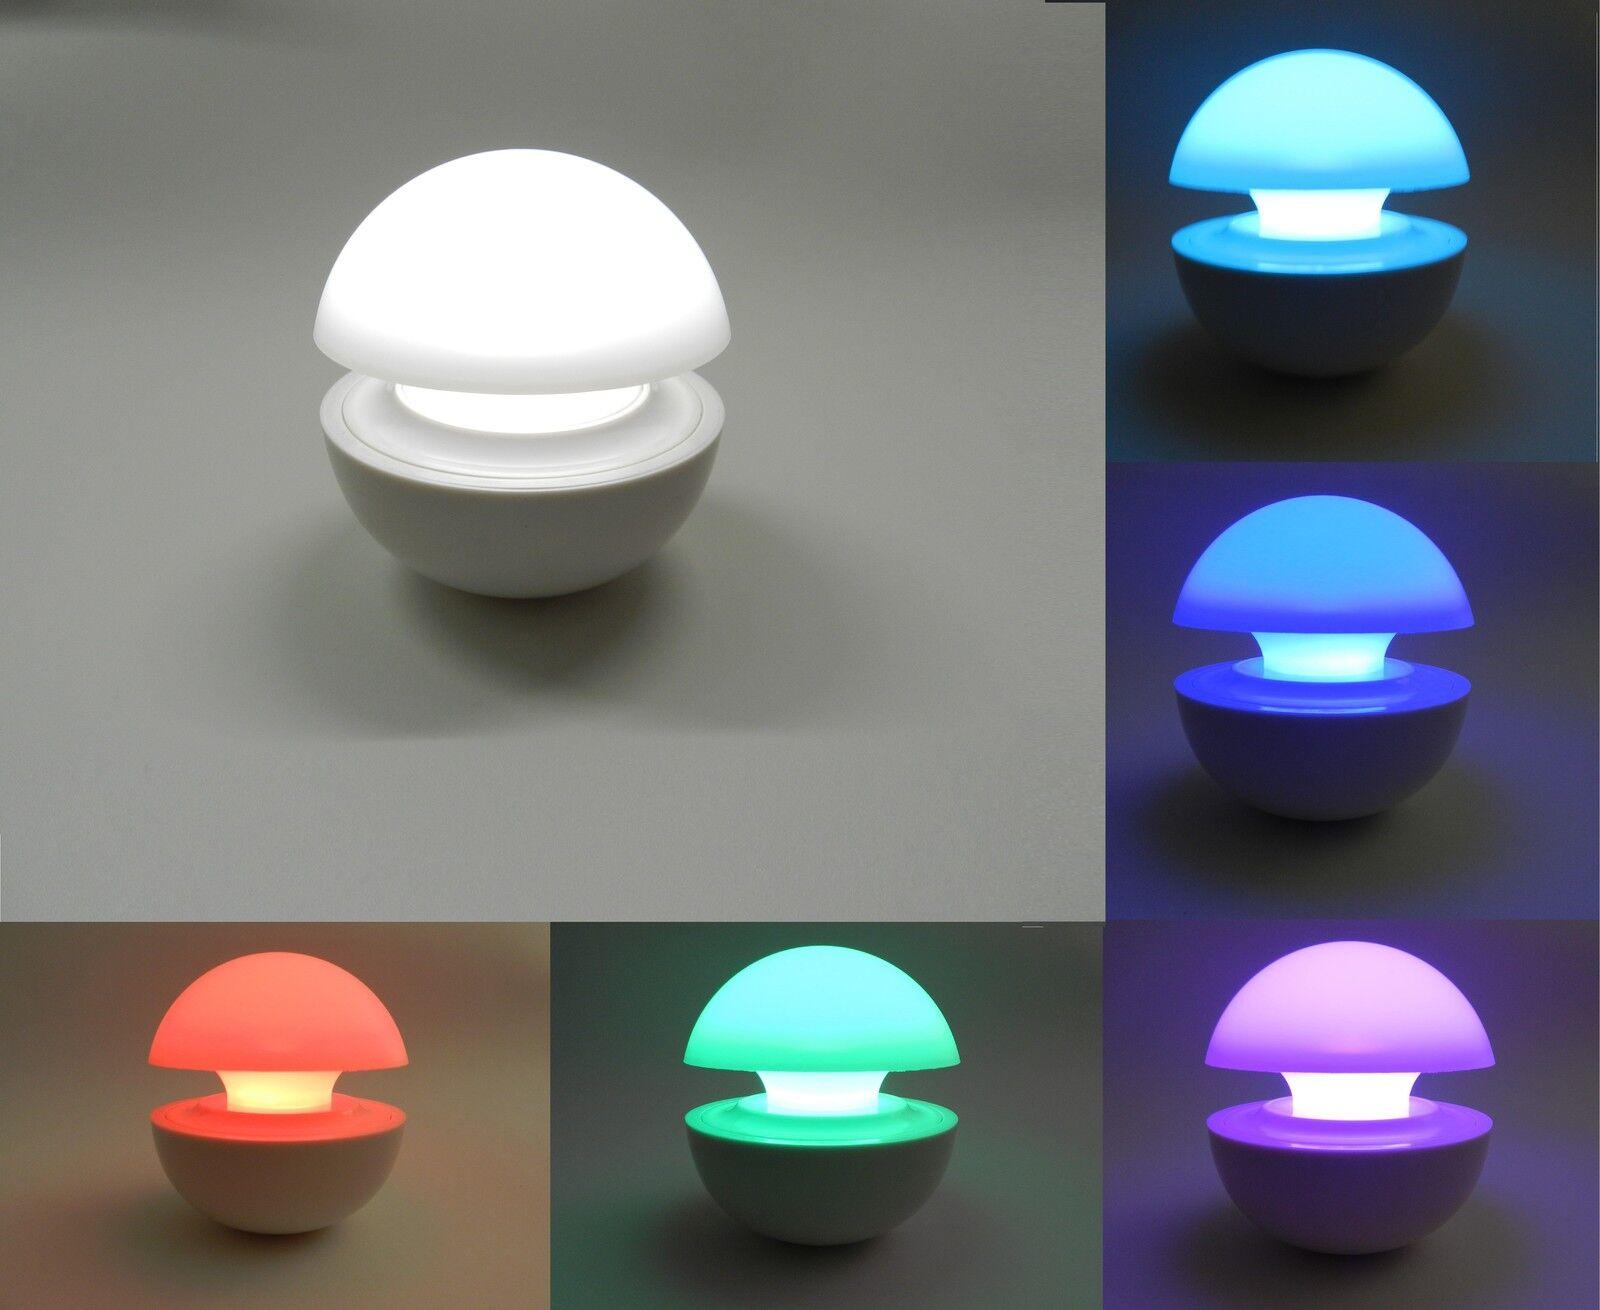 Lumino lampada led colori cromoterapia da tavolo comodino for Lampada led interno